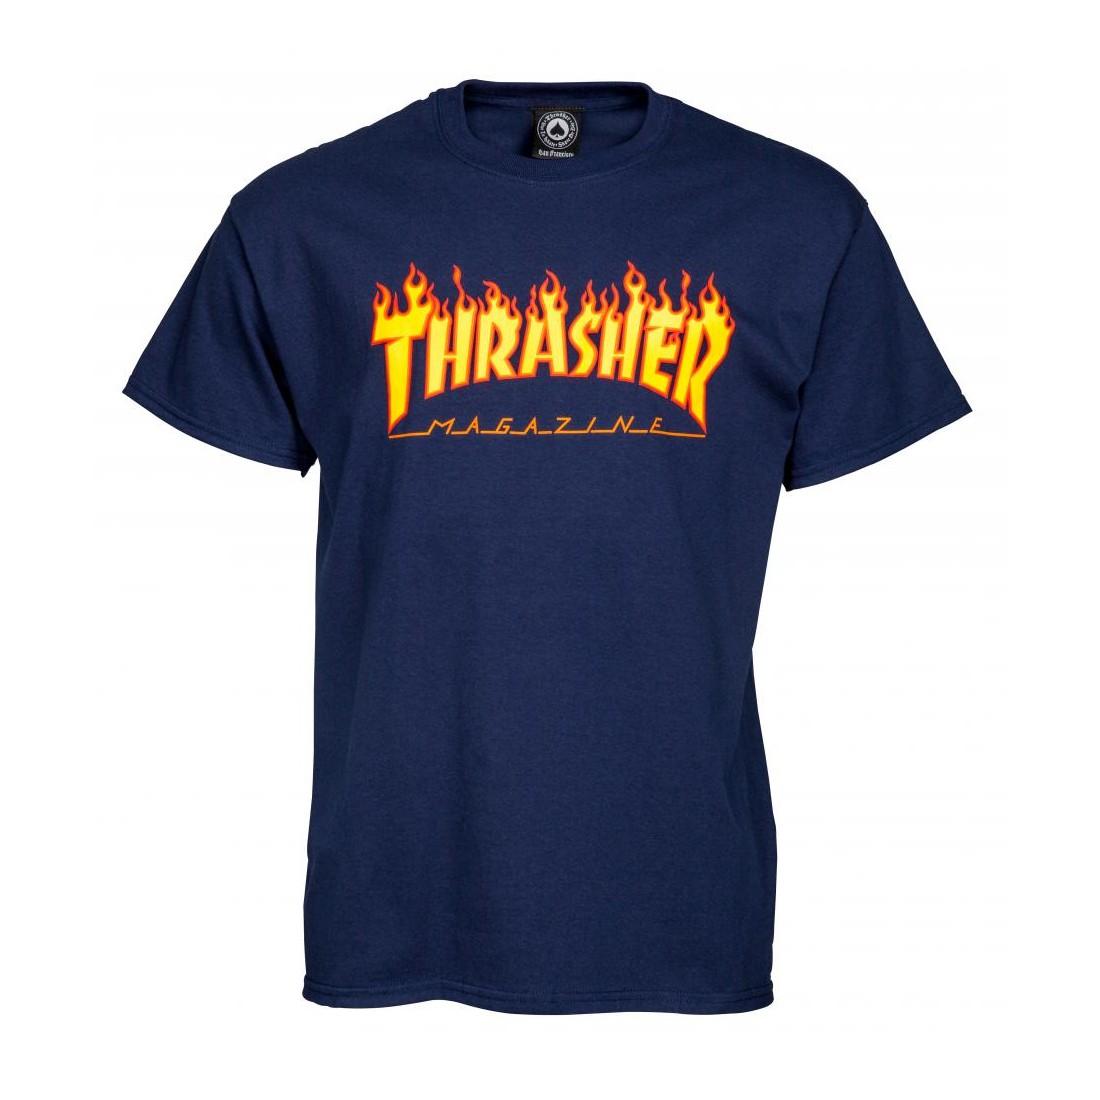 T Shirt Thrasher flame logo navy